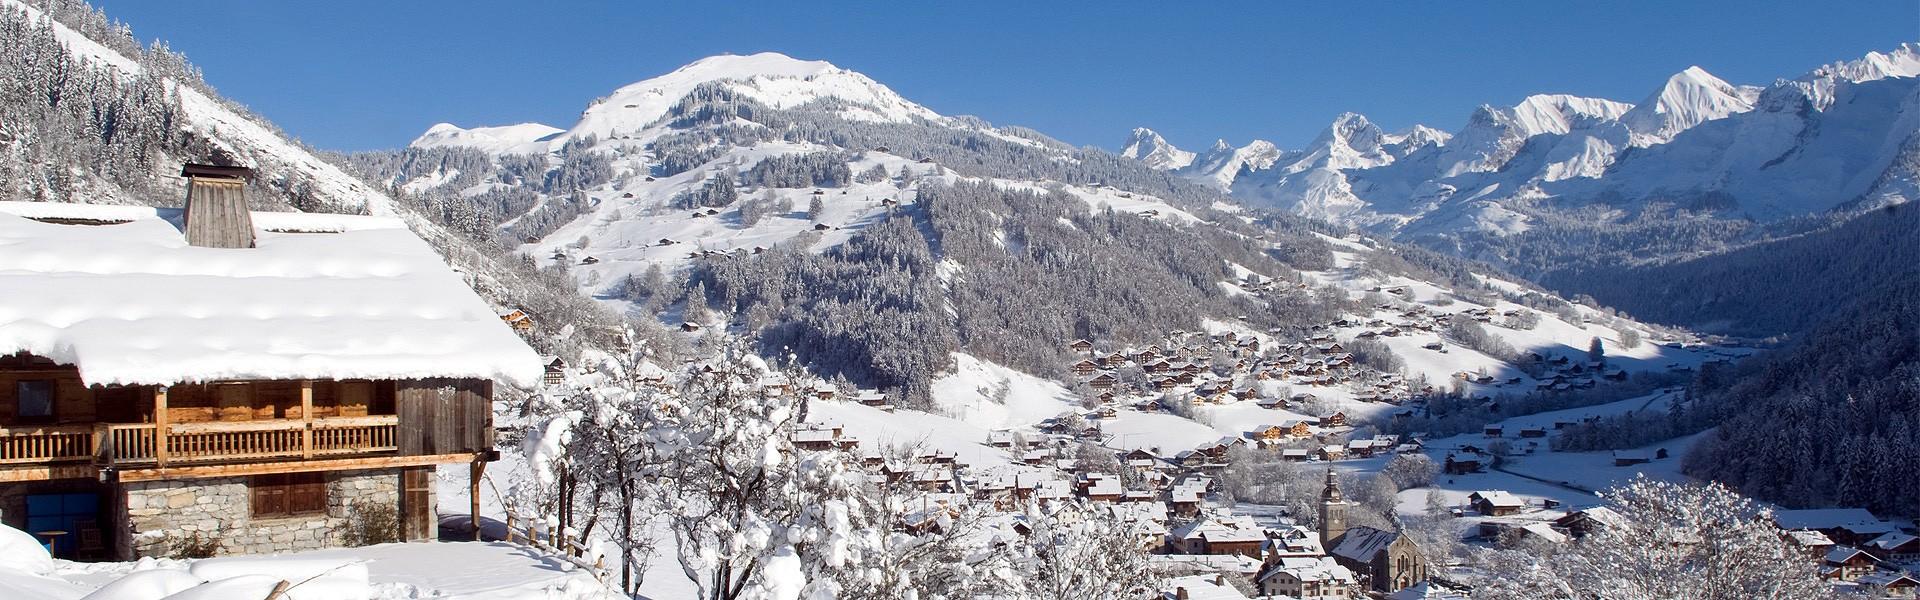 slide-int-village-vacances-2758